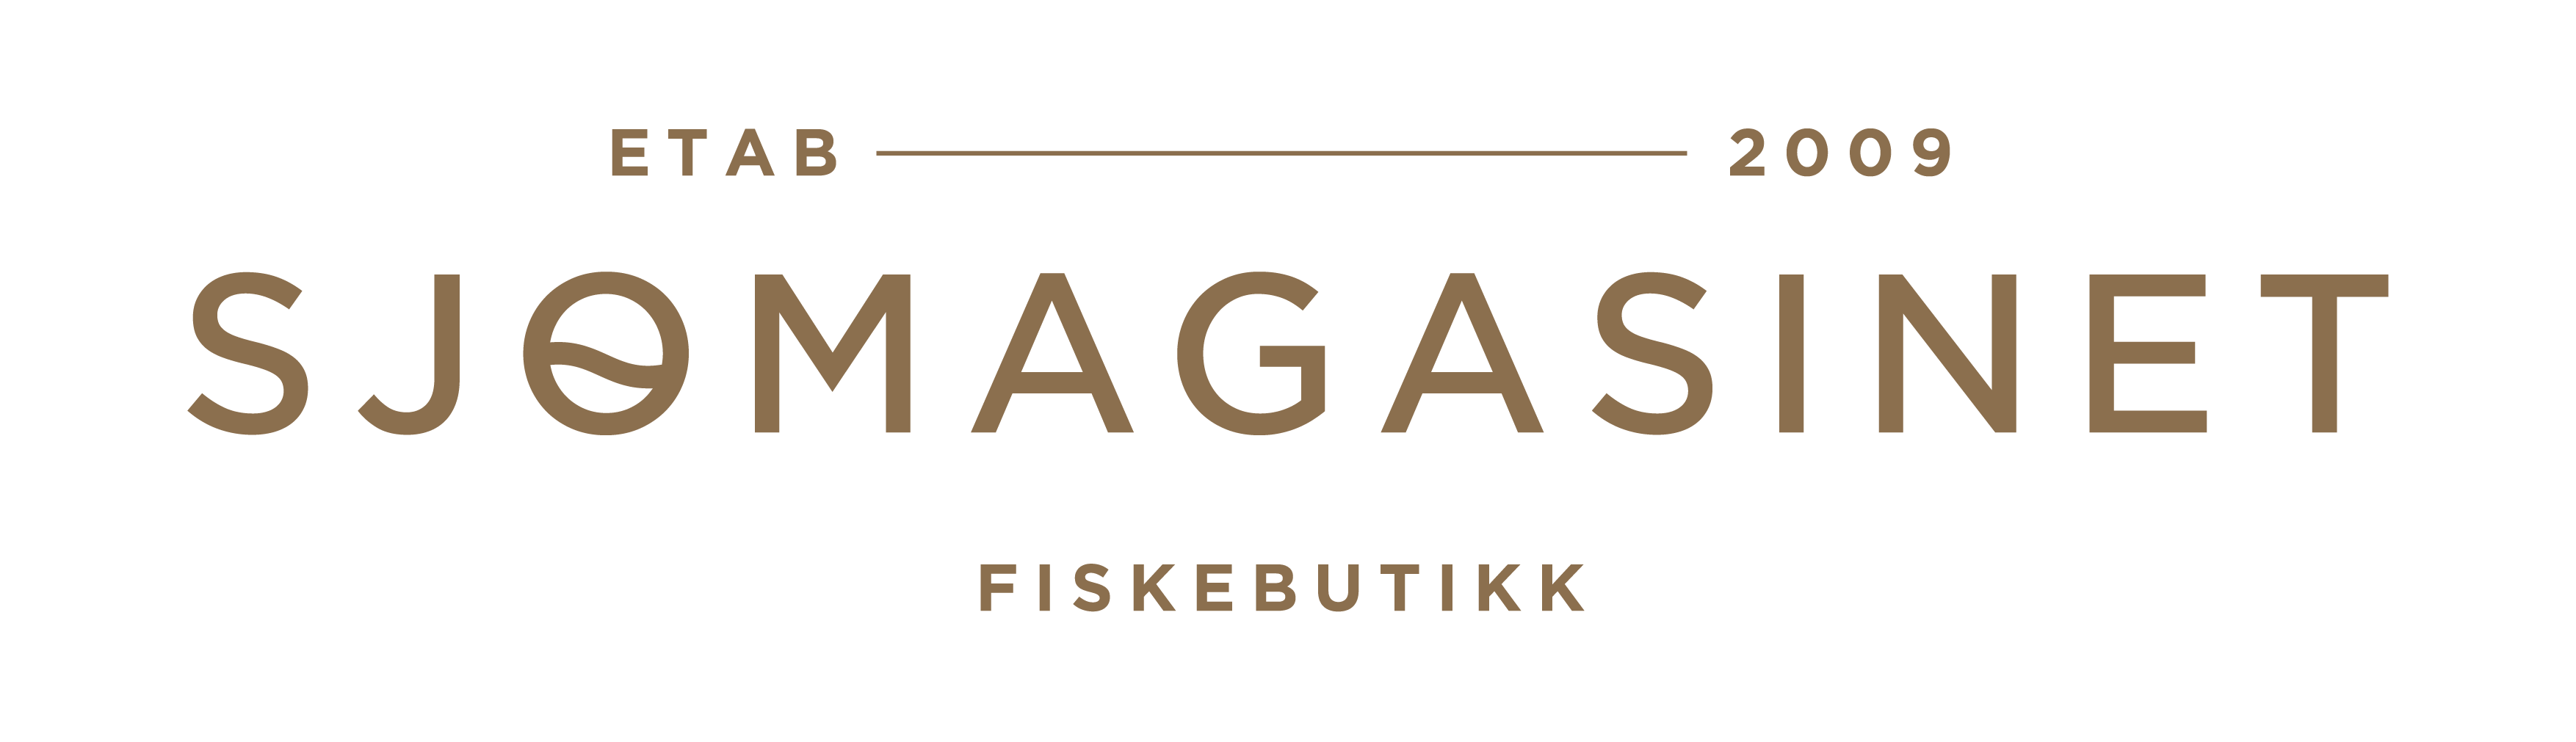 sjmagasinet_fiskebutikk_rgb-pms874c-01